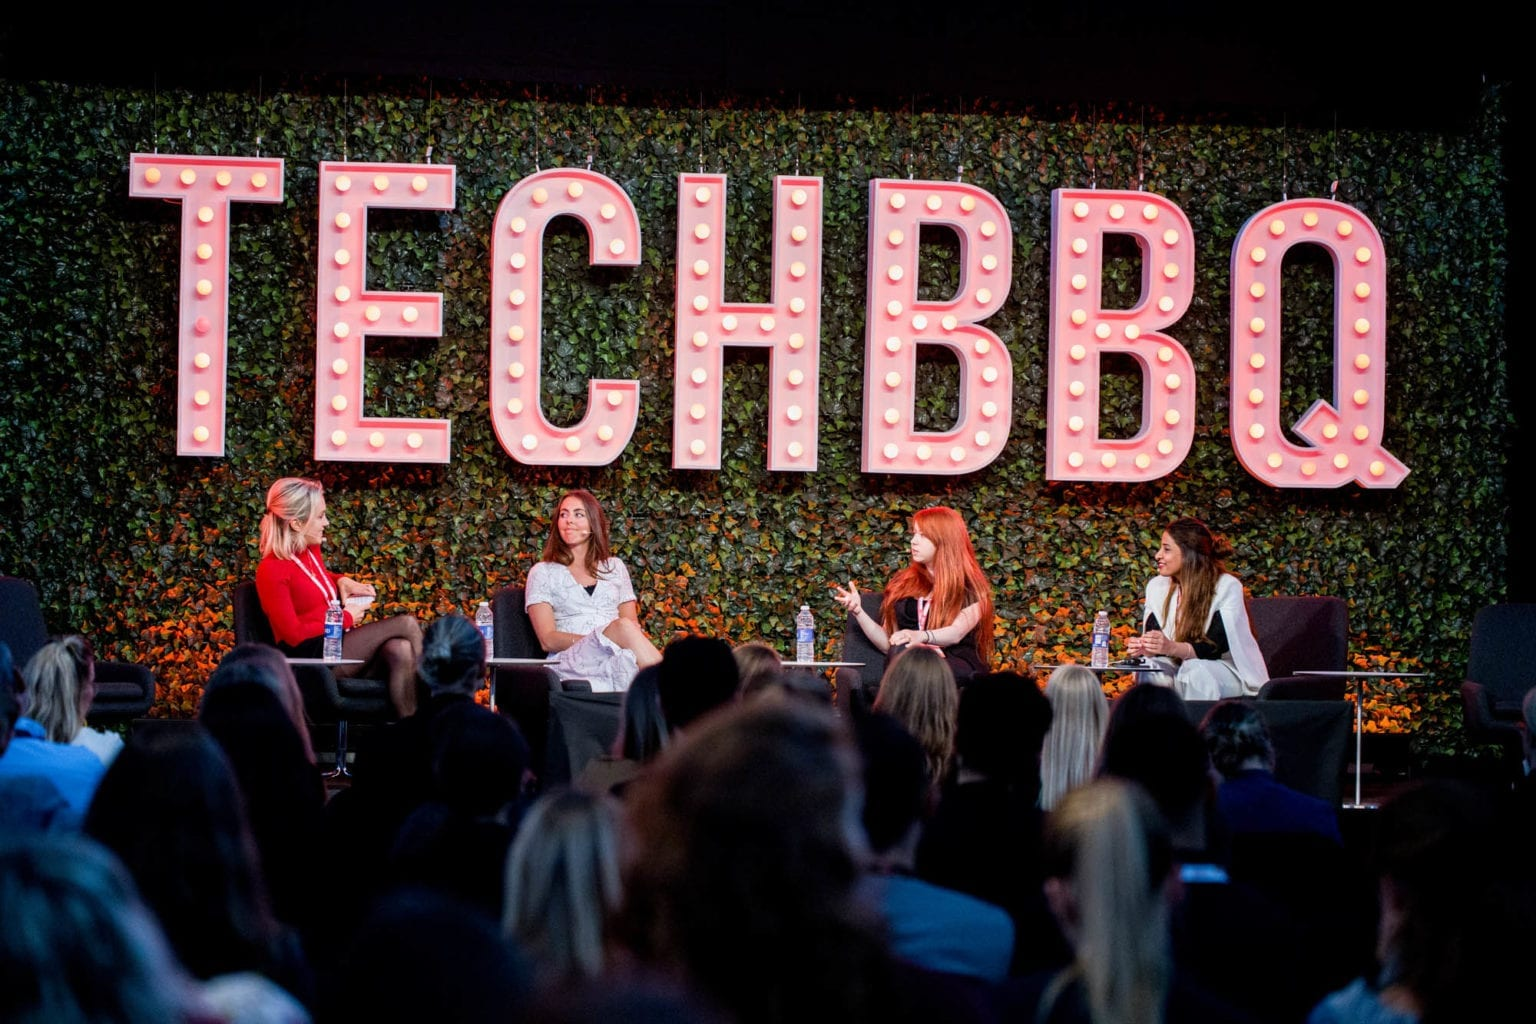 TechBBQ 2019